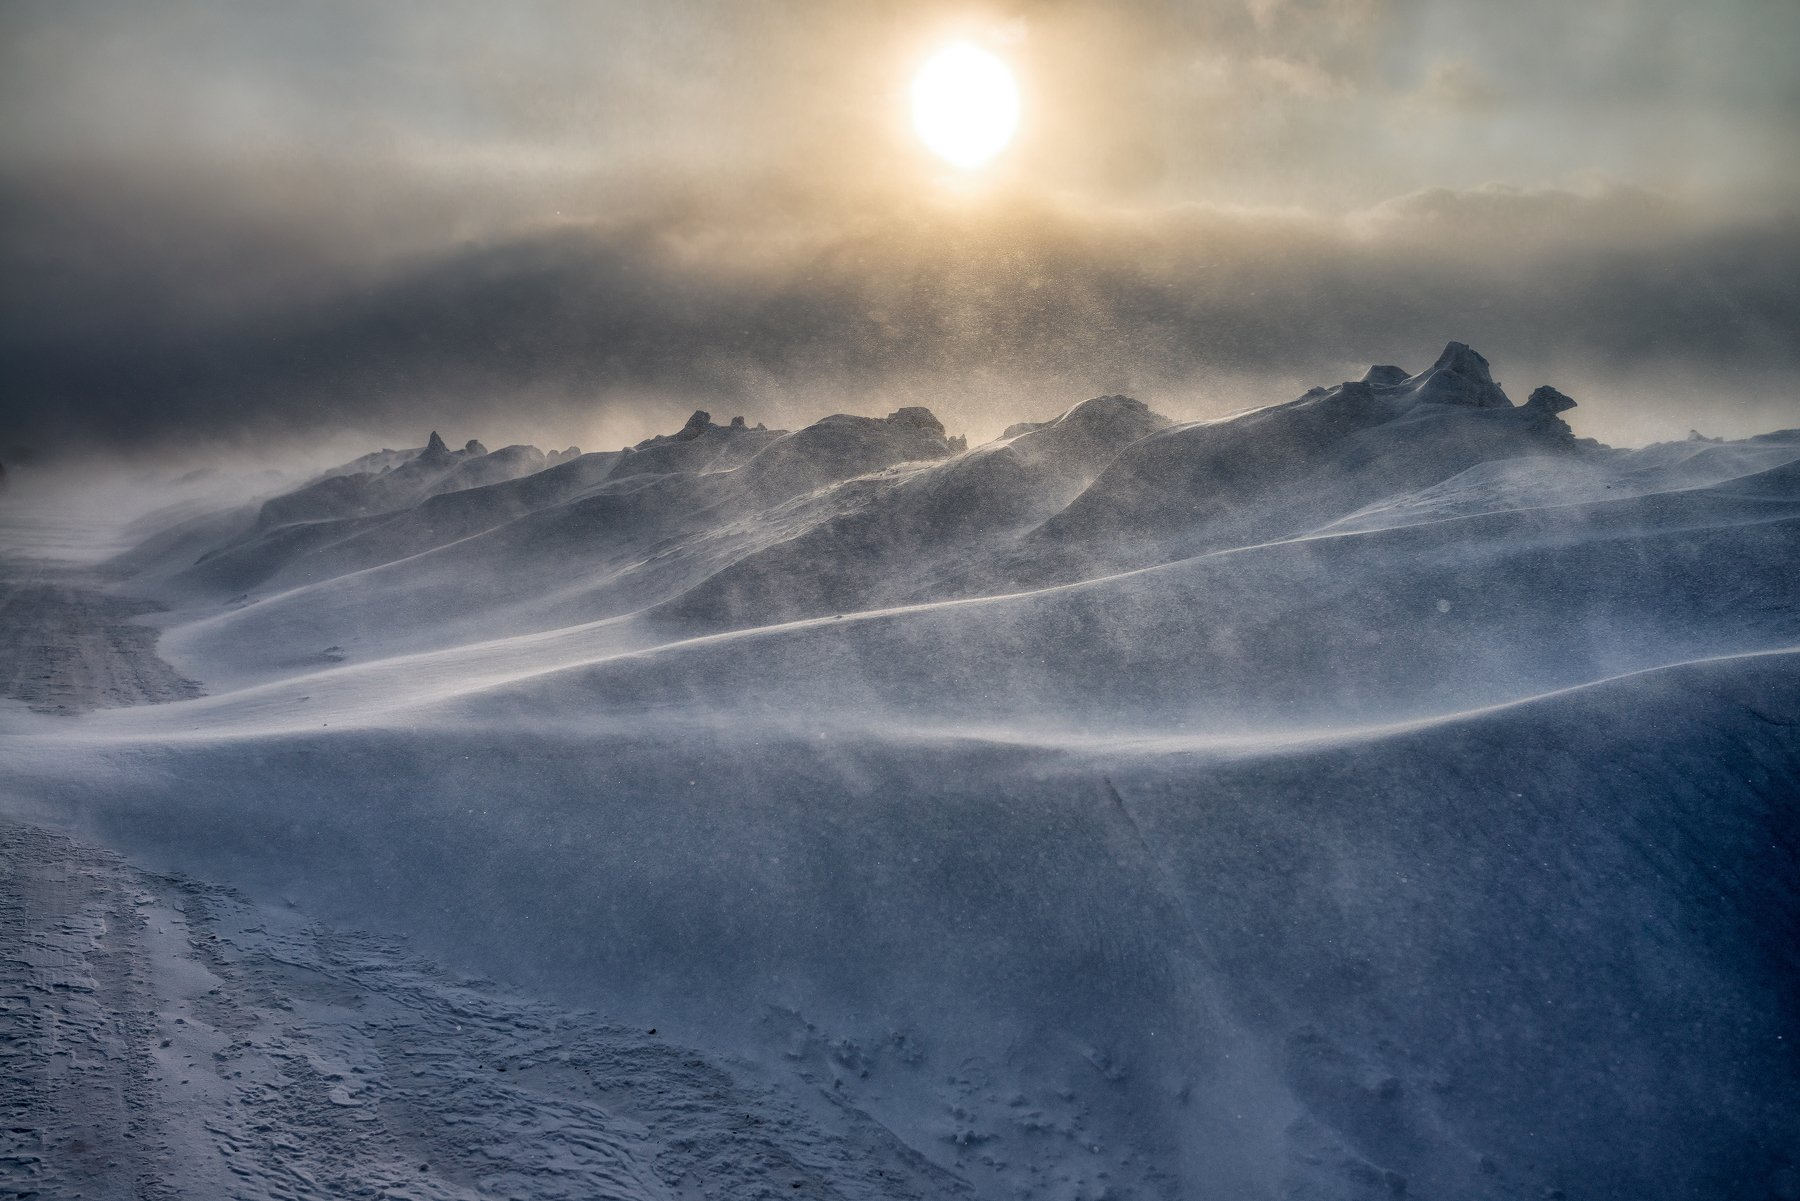 снег, солнце, зима, метель, сибирь 2019, Дмитрий Дубиковский